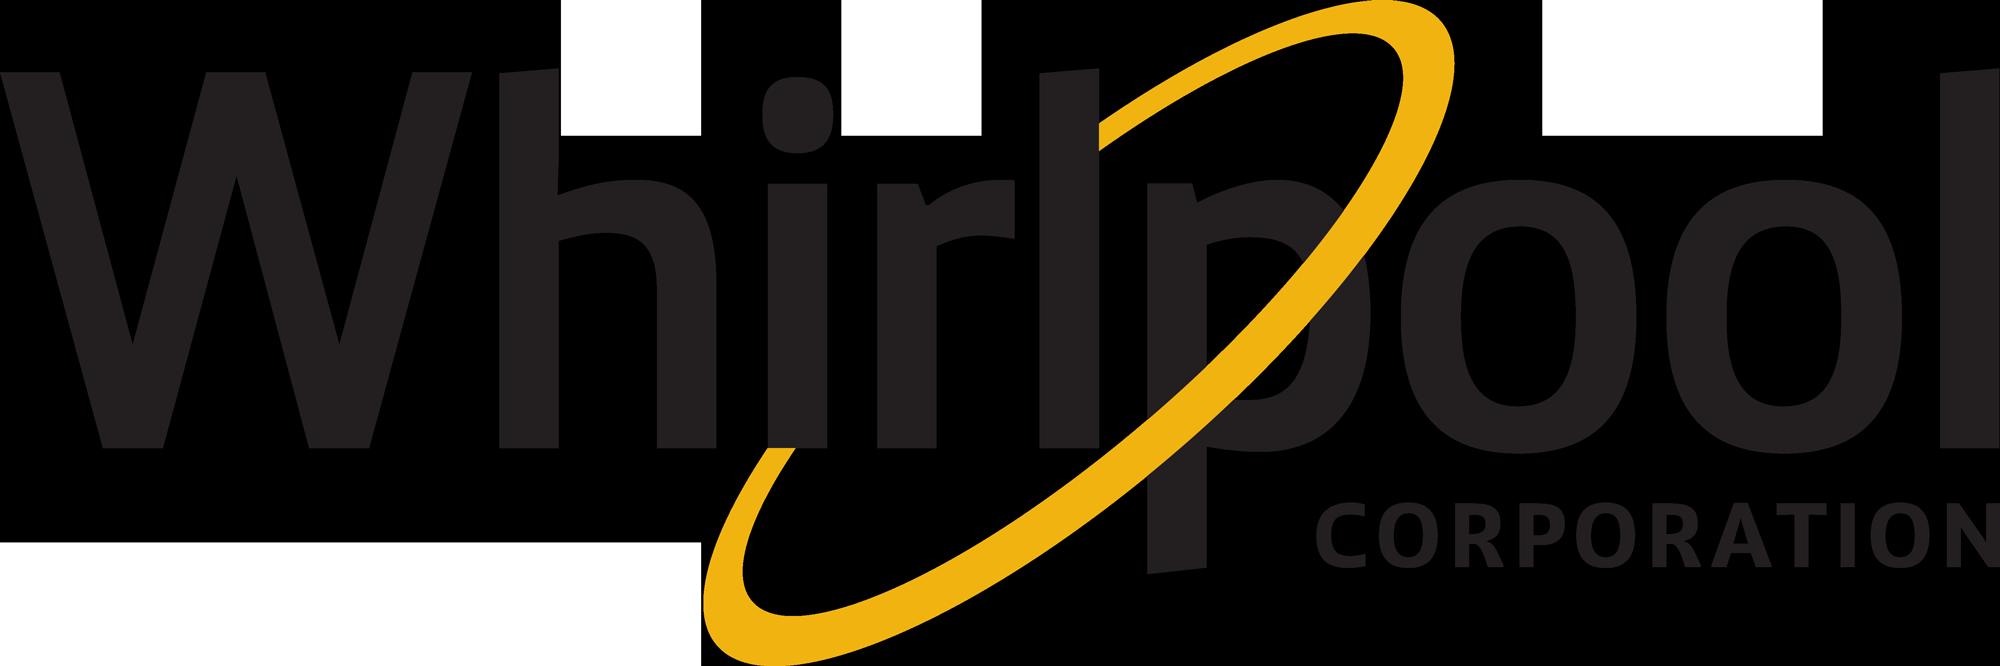 Whirlpool_Fio